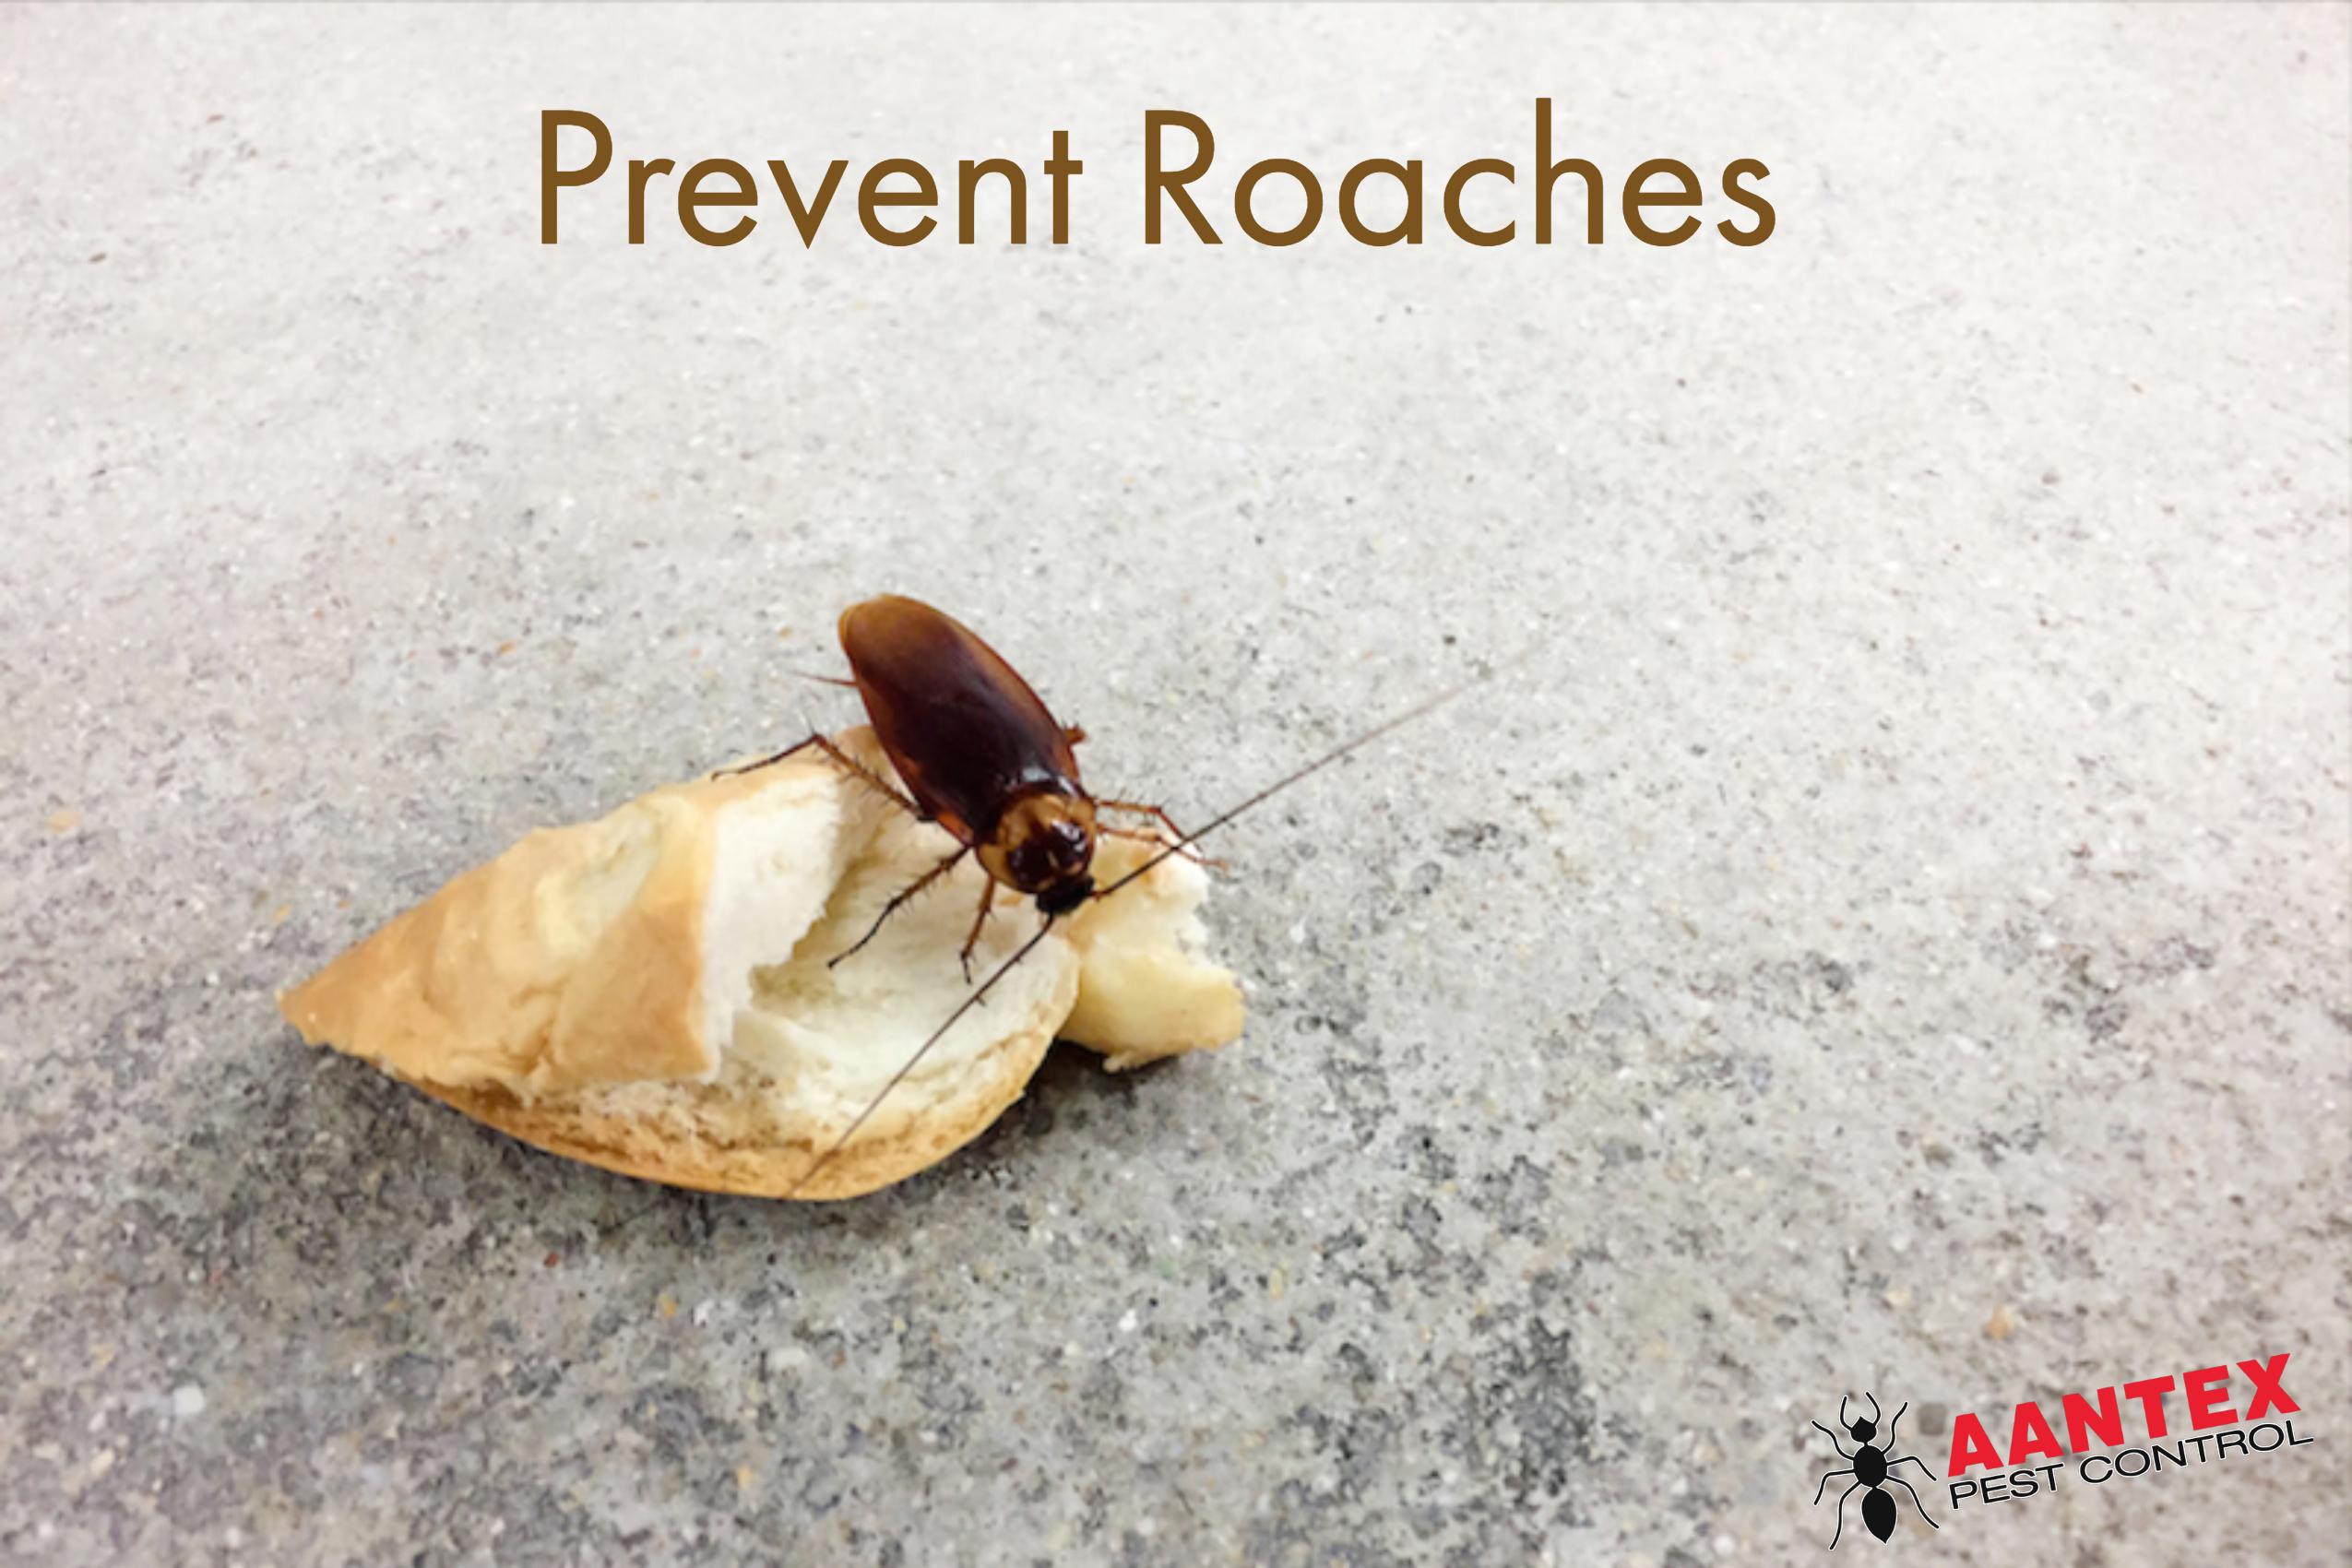 Prevent Roaches - Aantex Pest